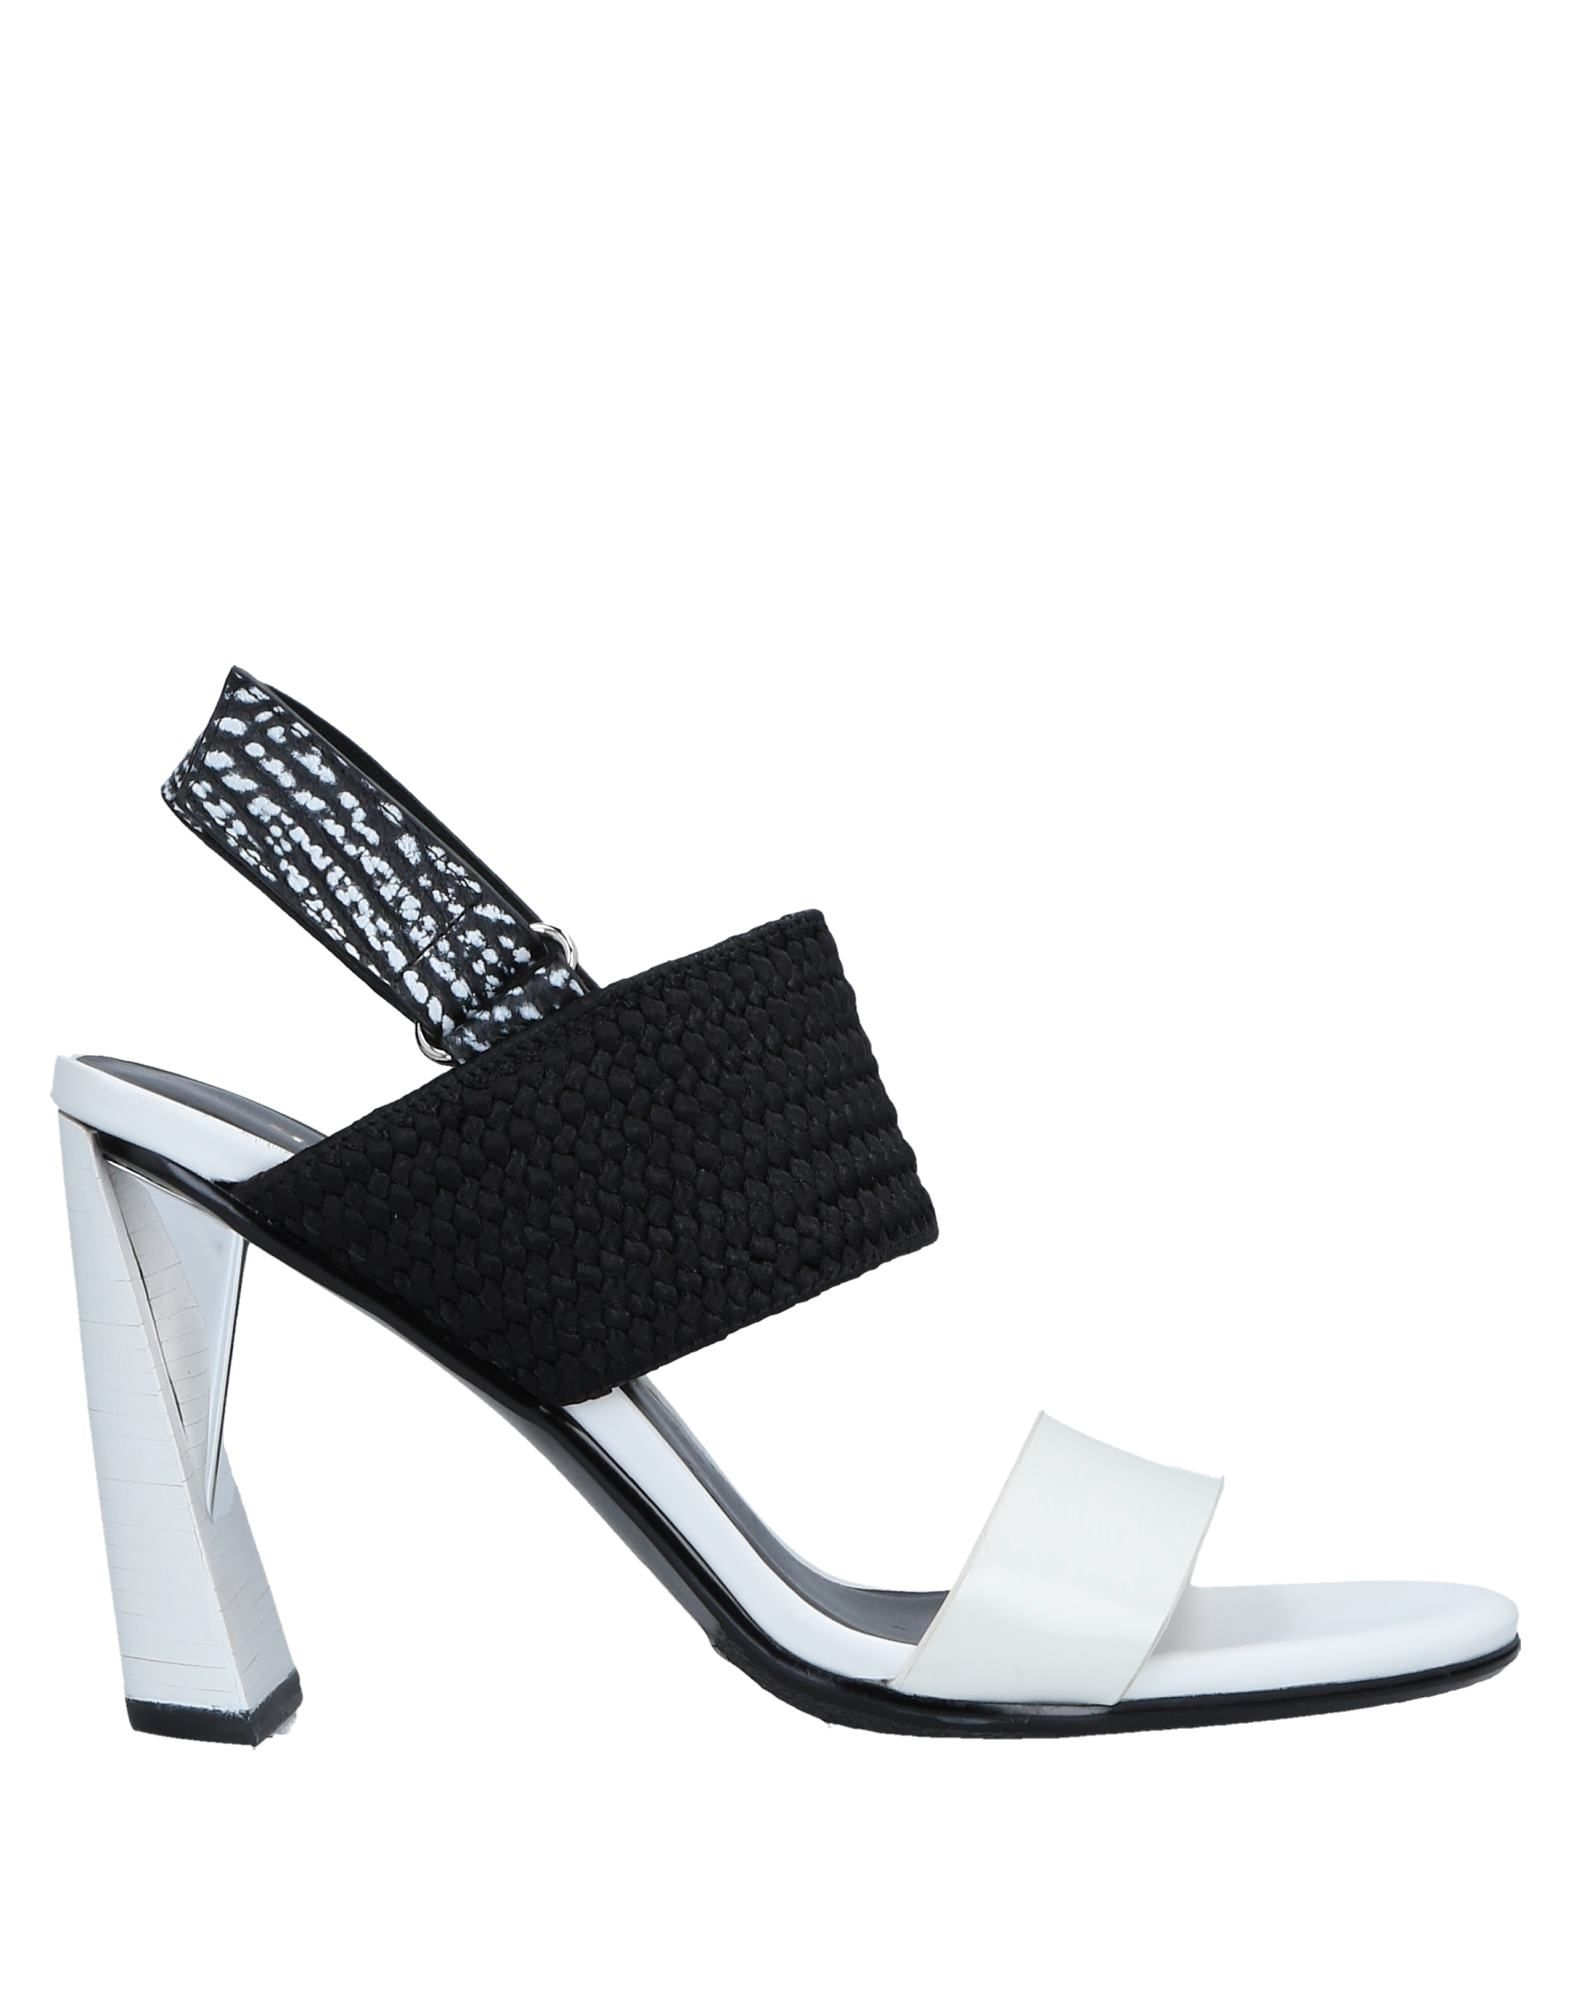 United Nude Sandalen beliebte Damen  11533982GA Gute Qualität beliebte Sandalen Schuhe 5dc4e3